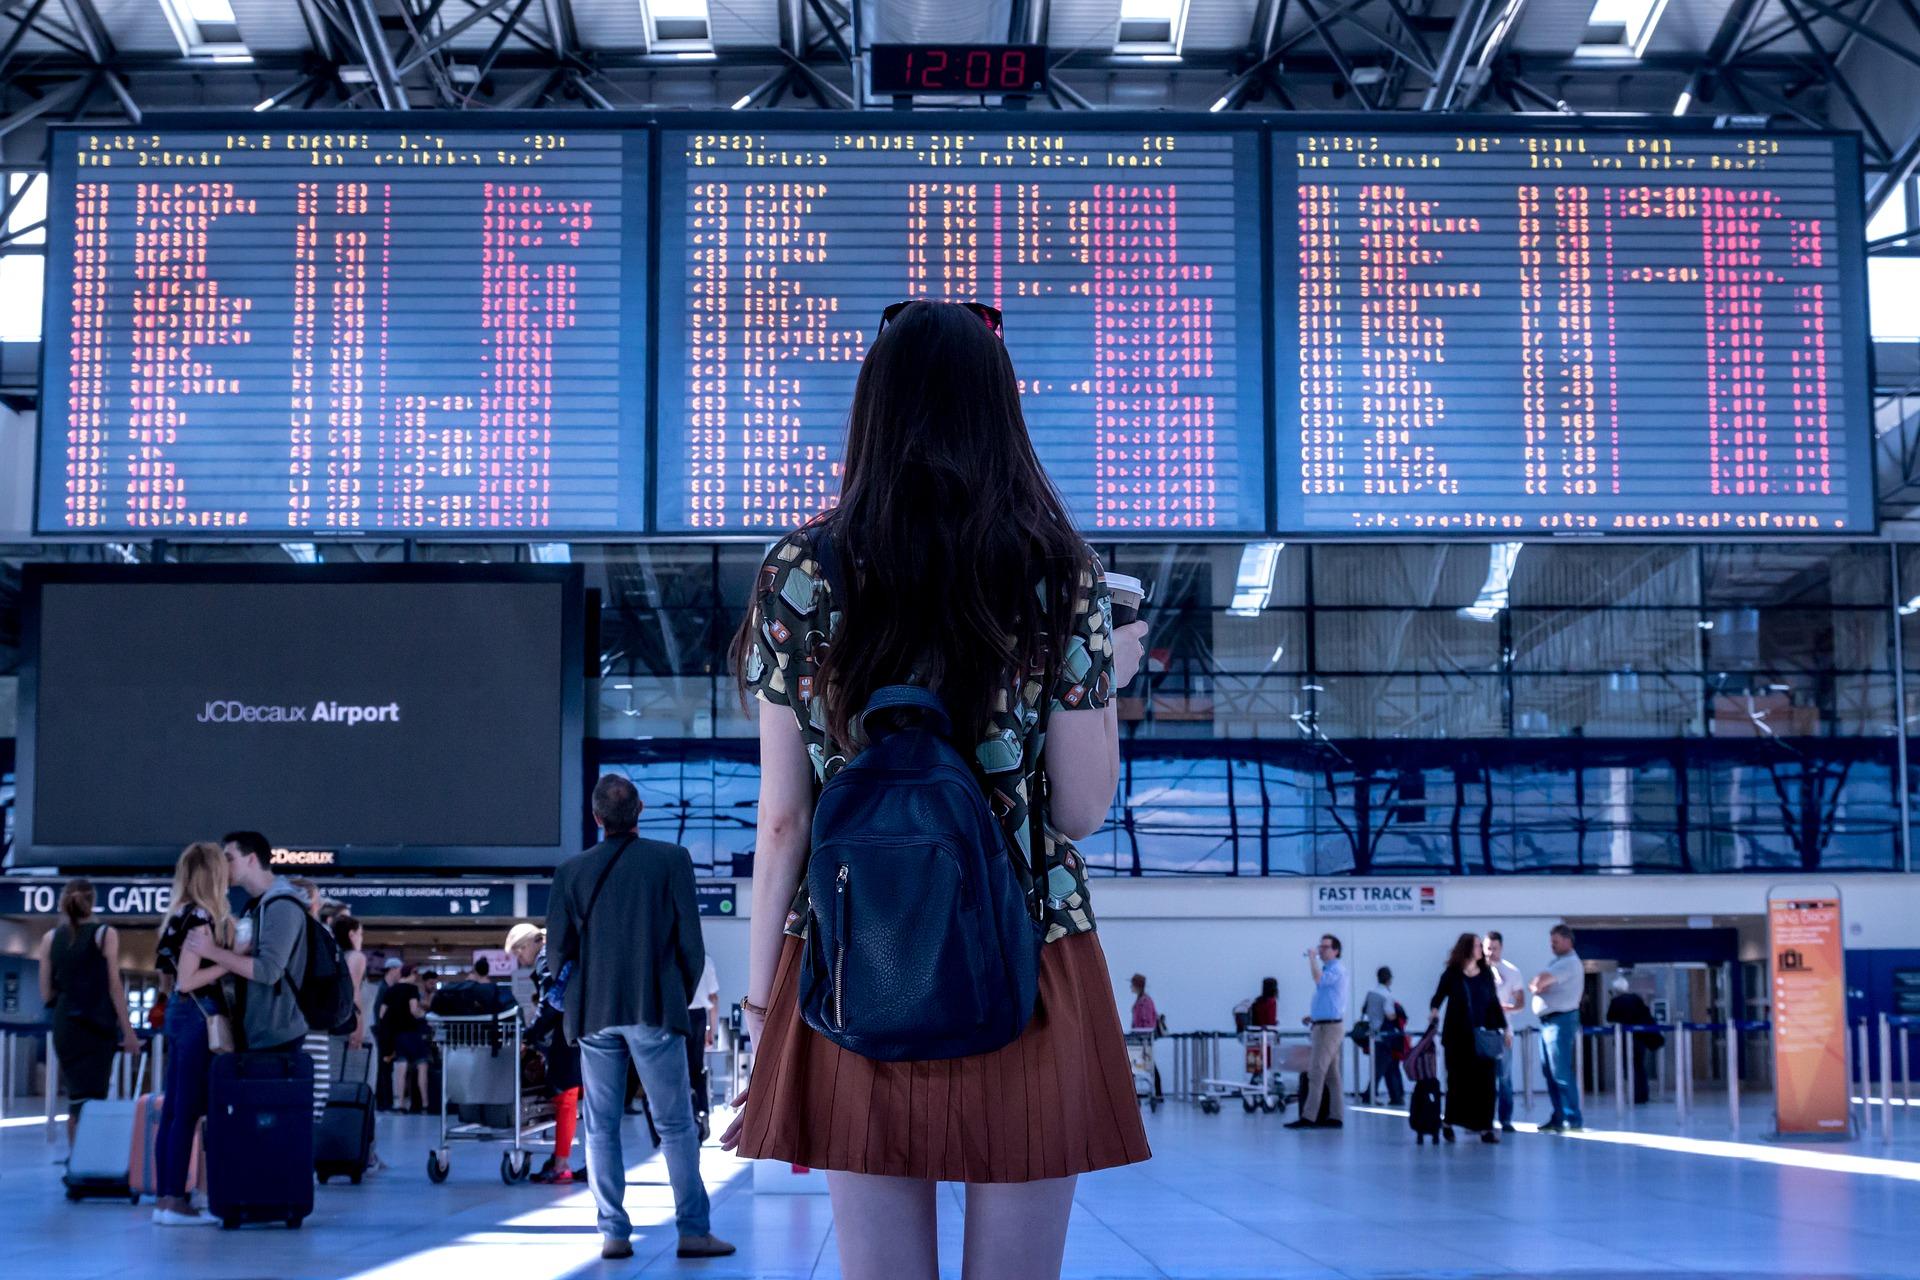 girl in airport, plane, flight